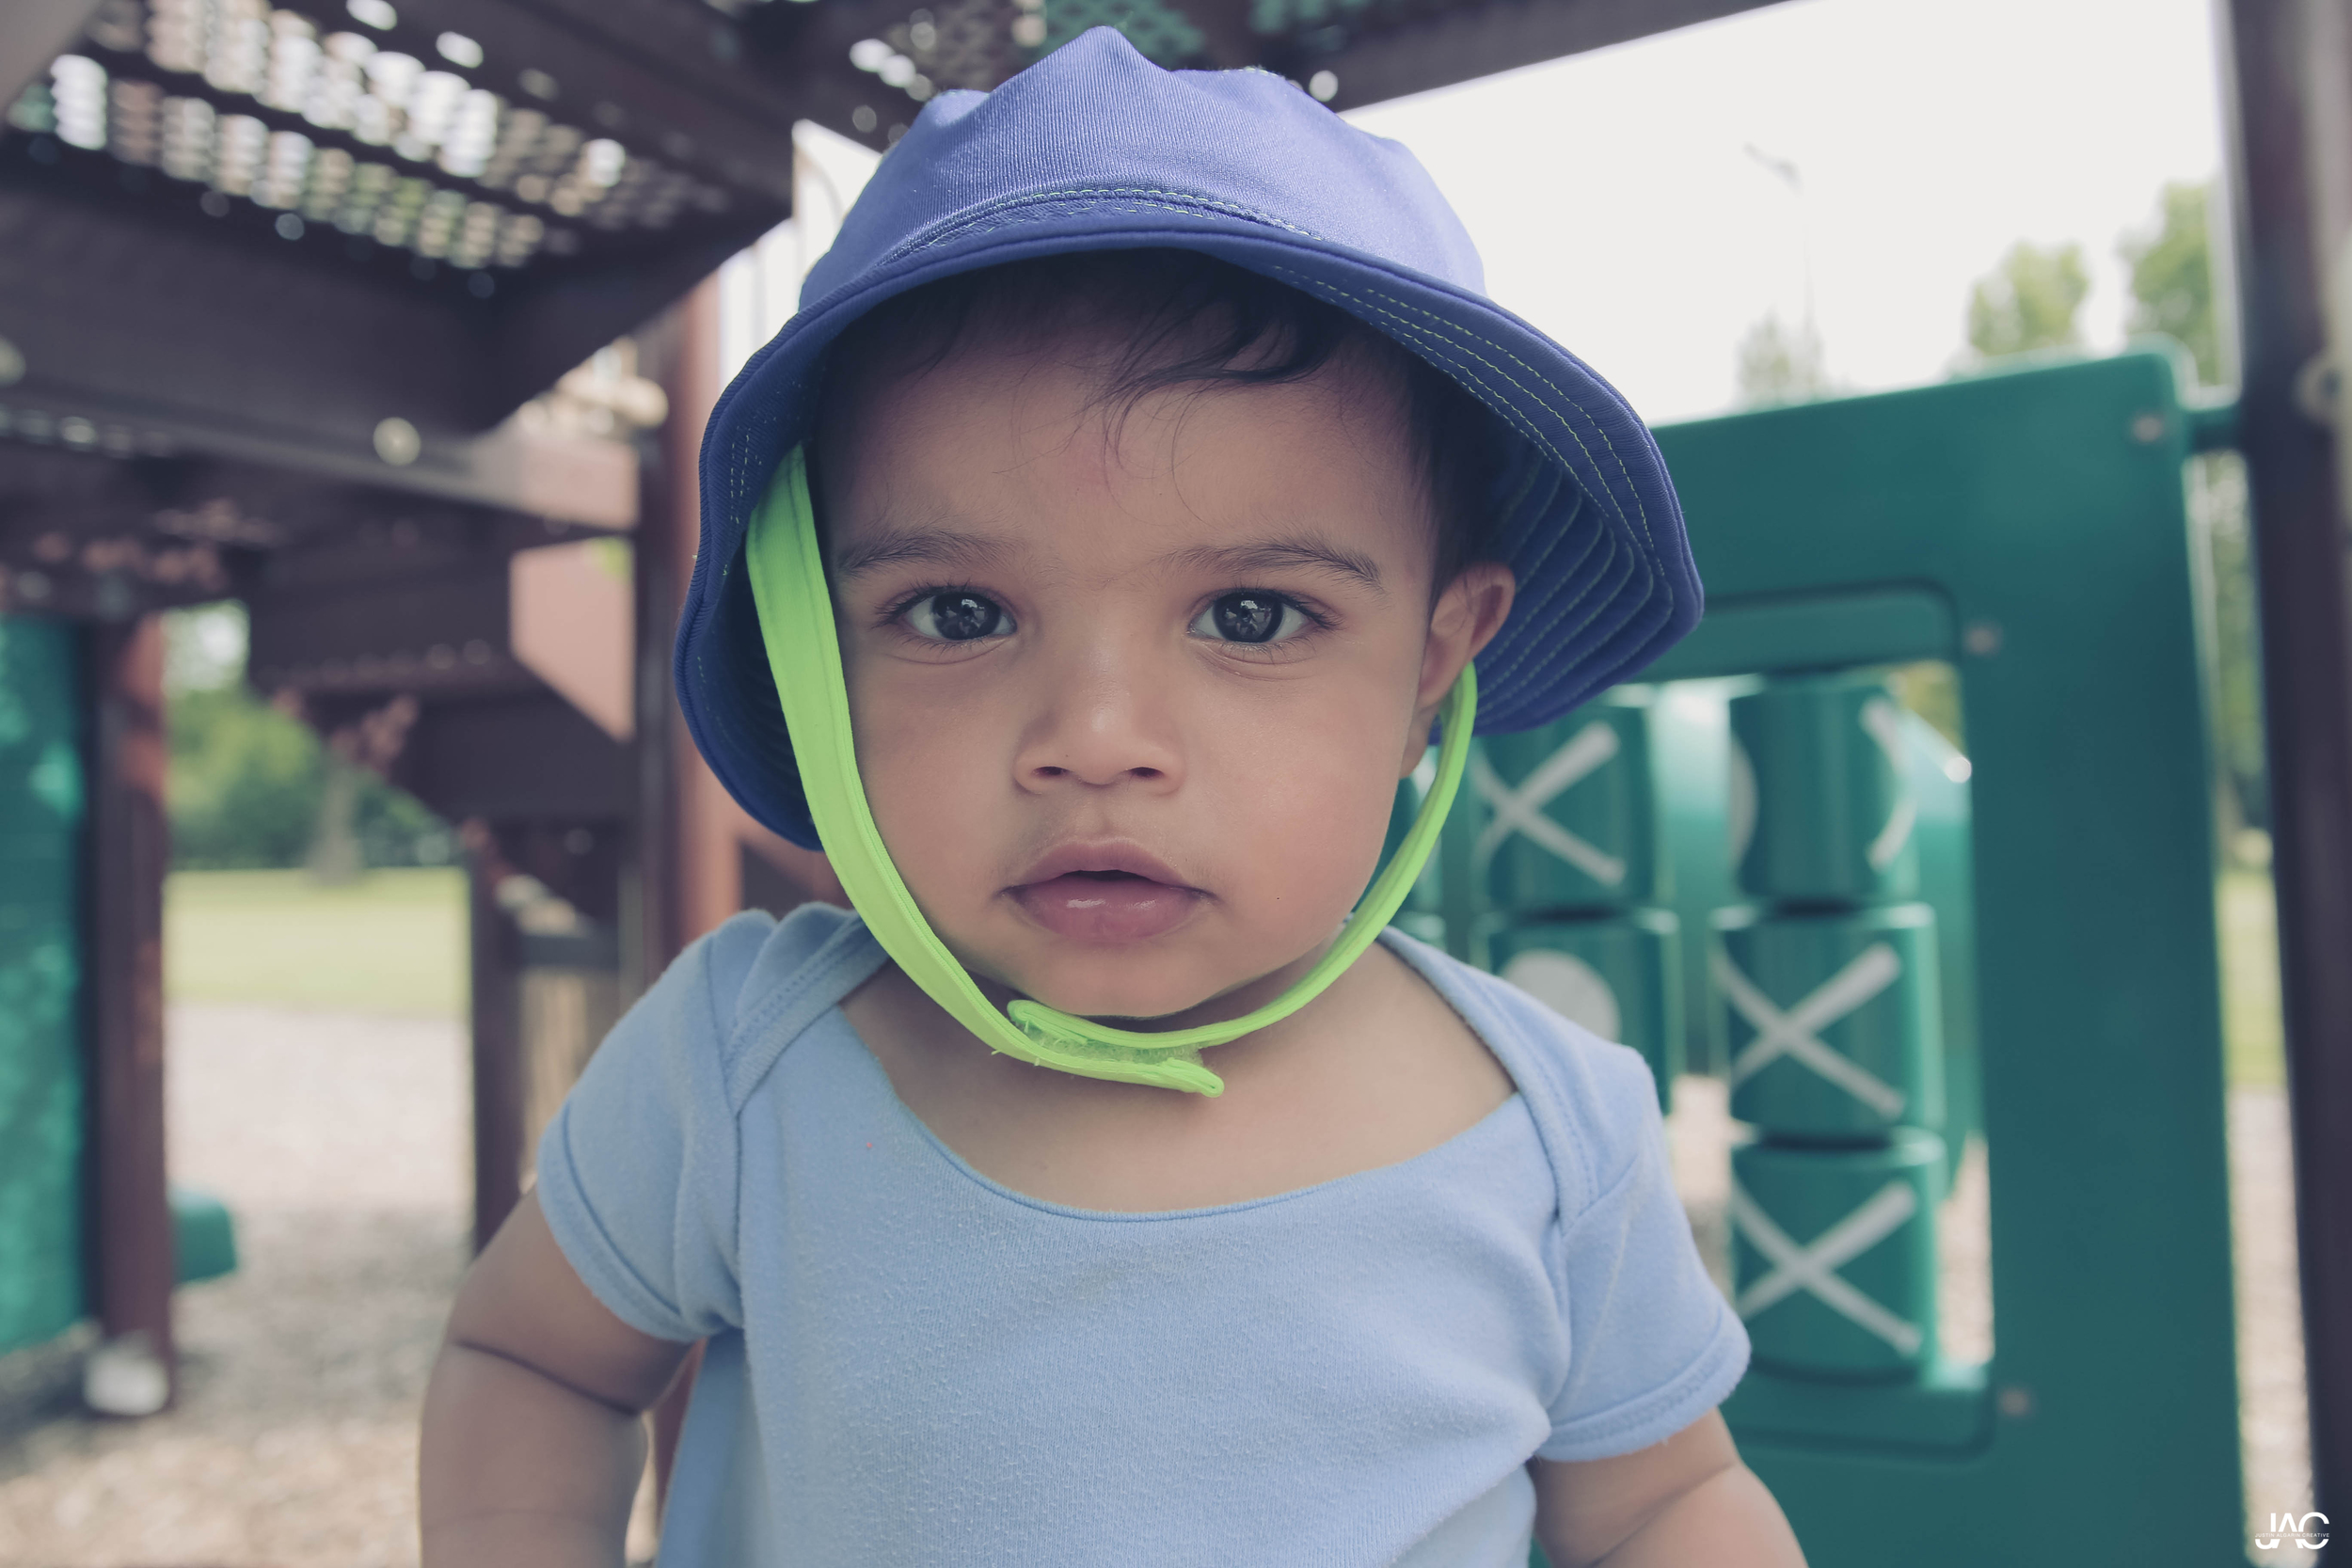 Jacob at Park 10.jpg